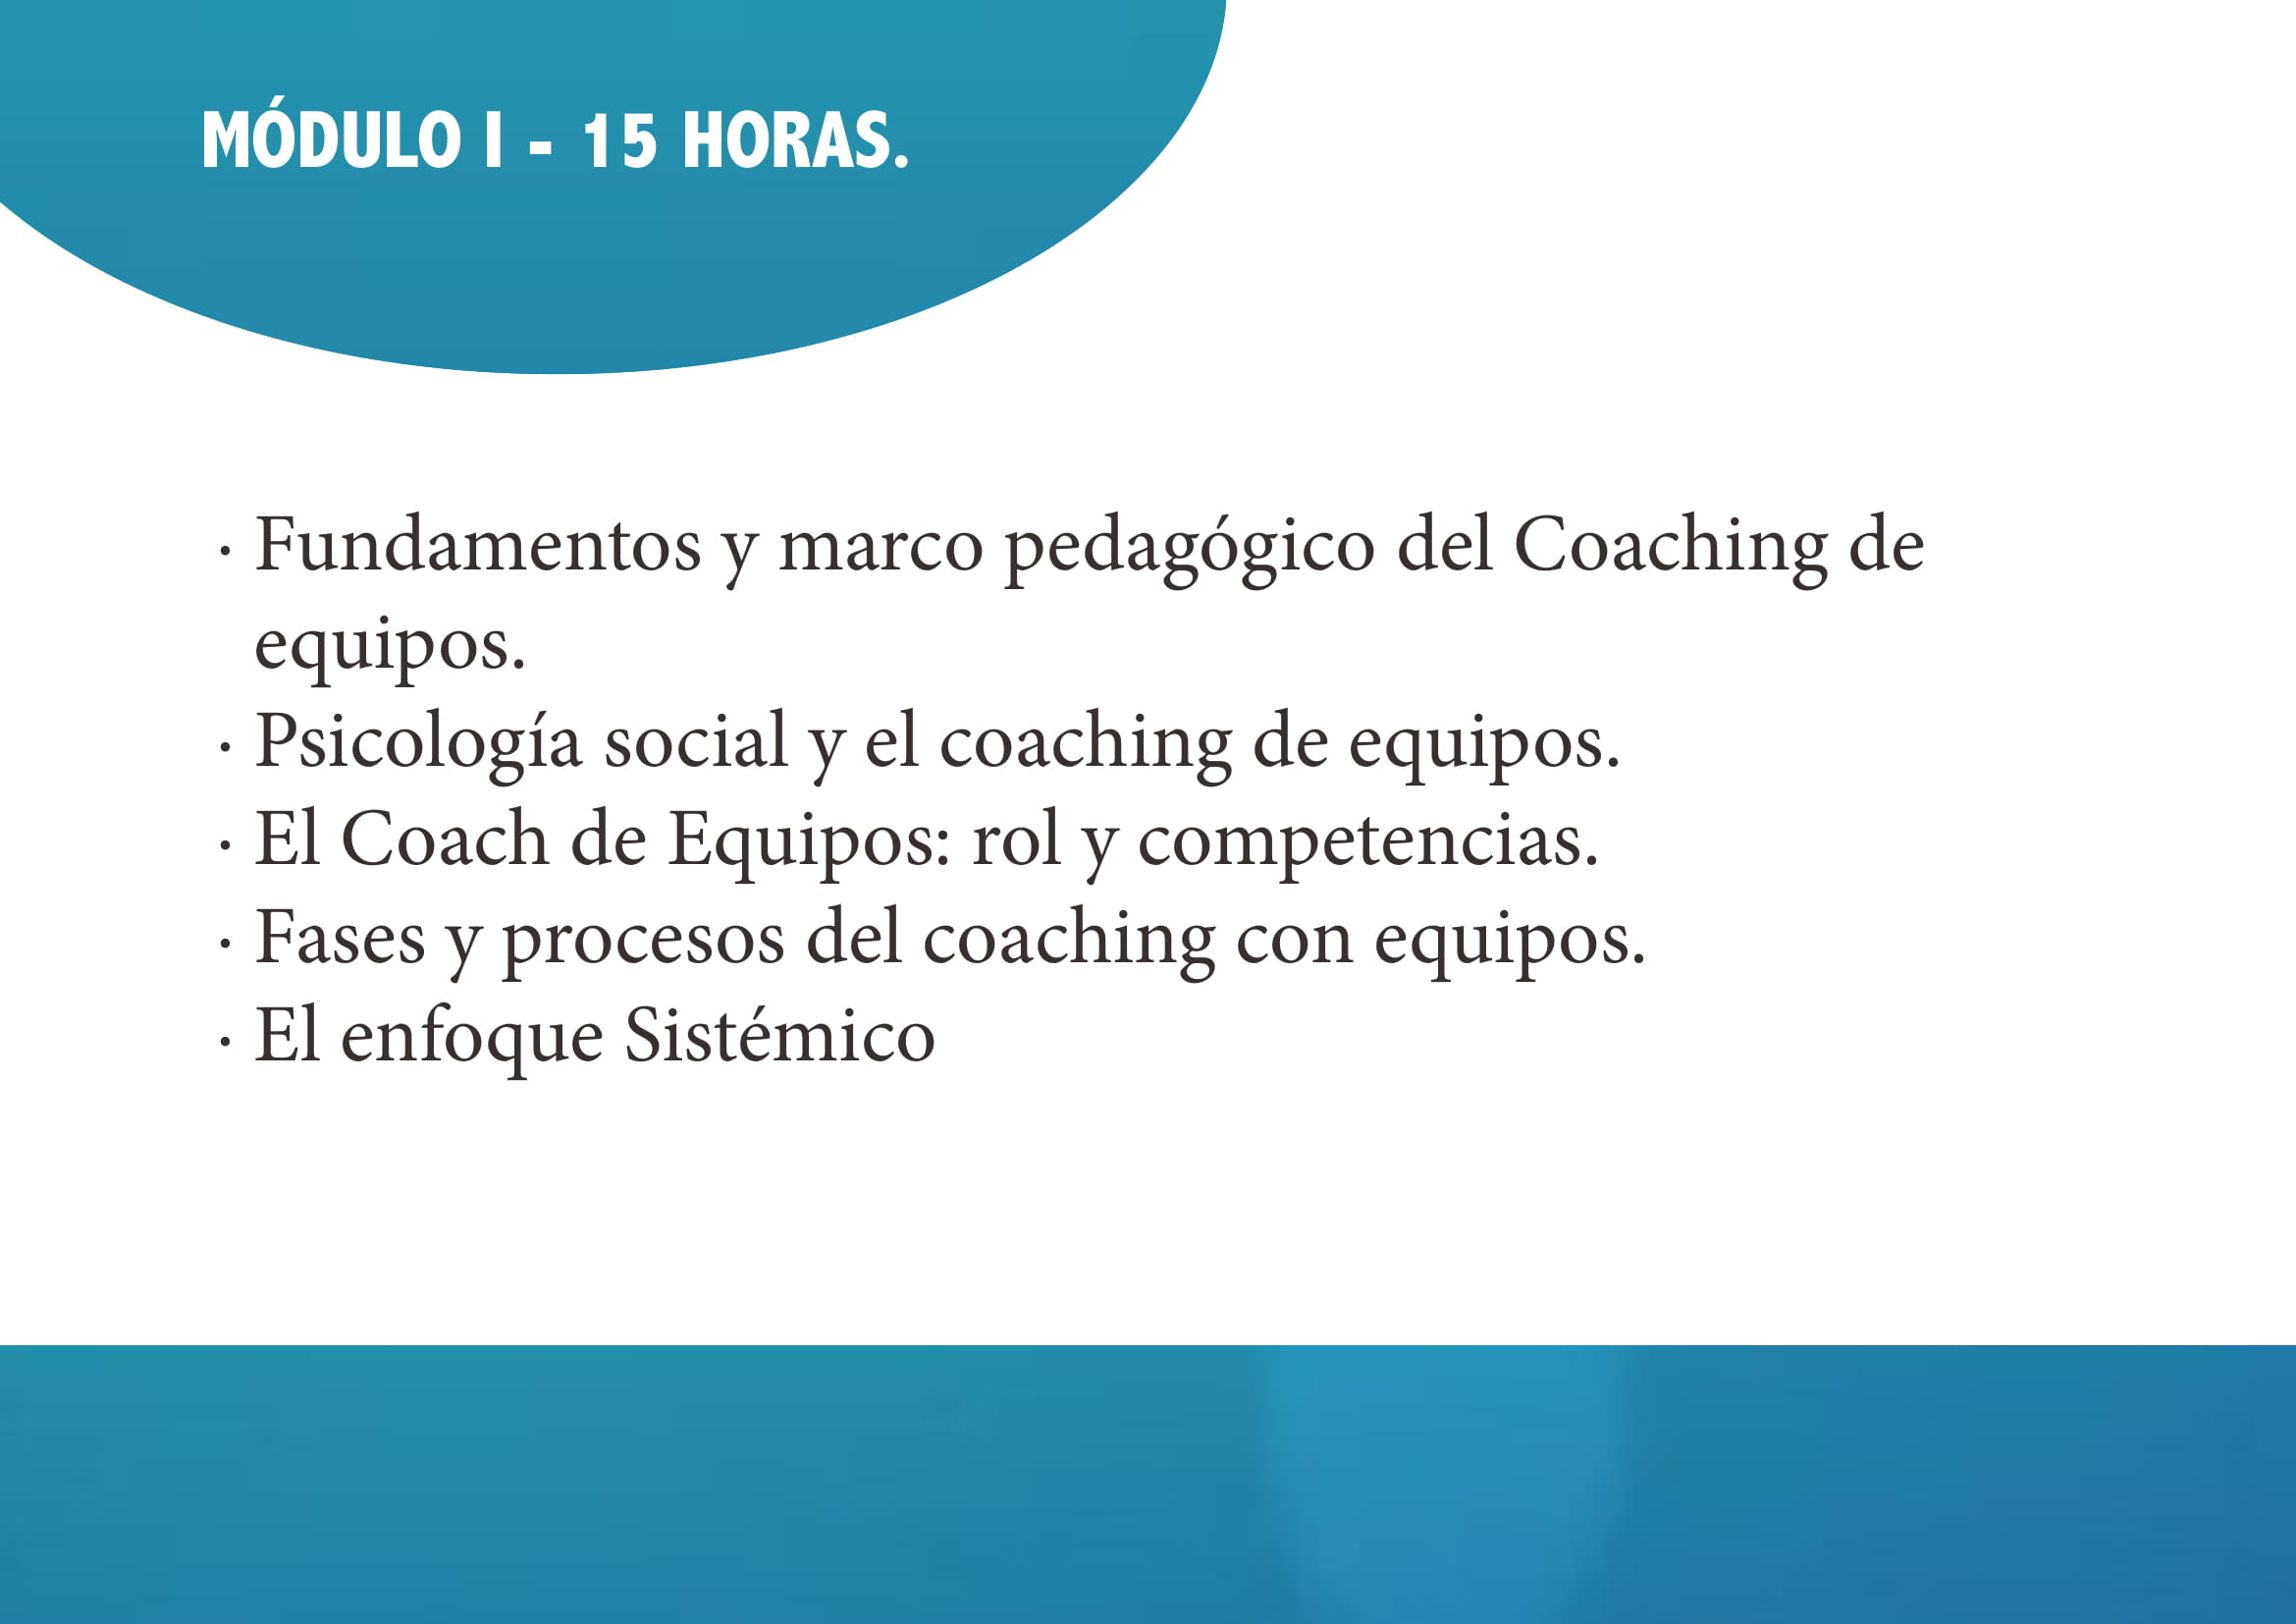 Experto Coaching de Equipos 2018 05